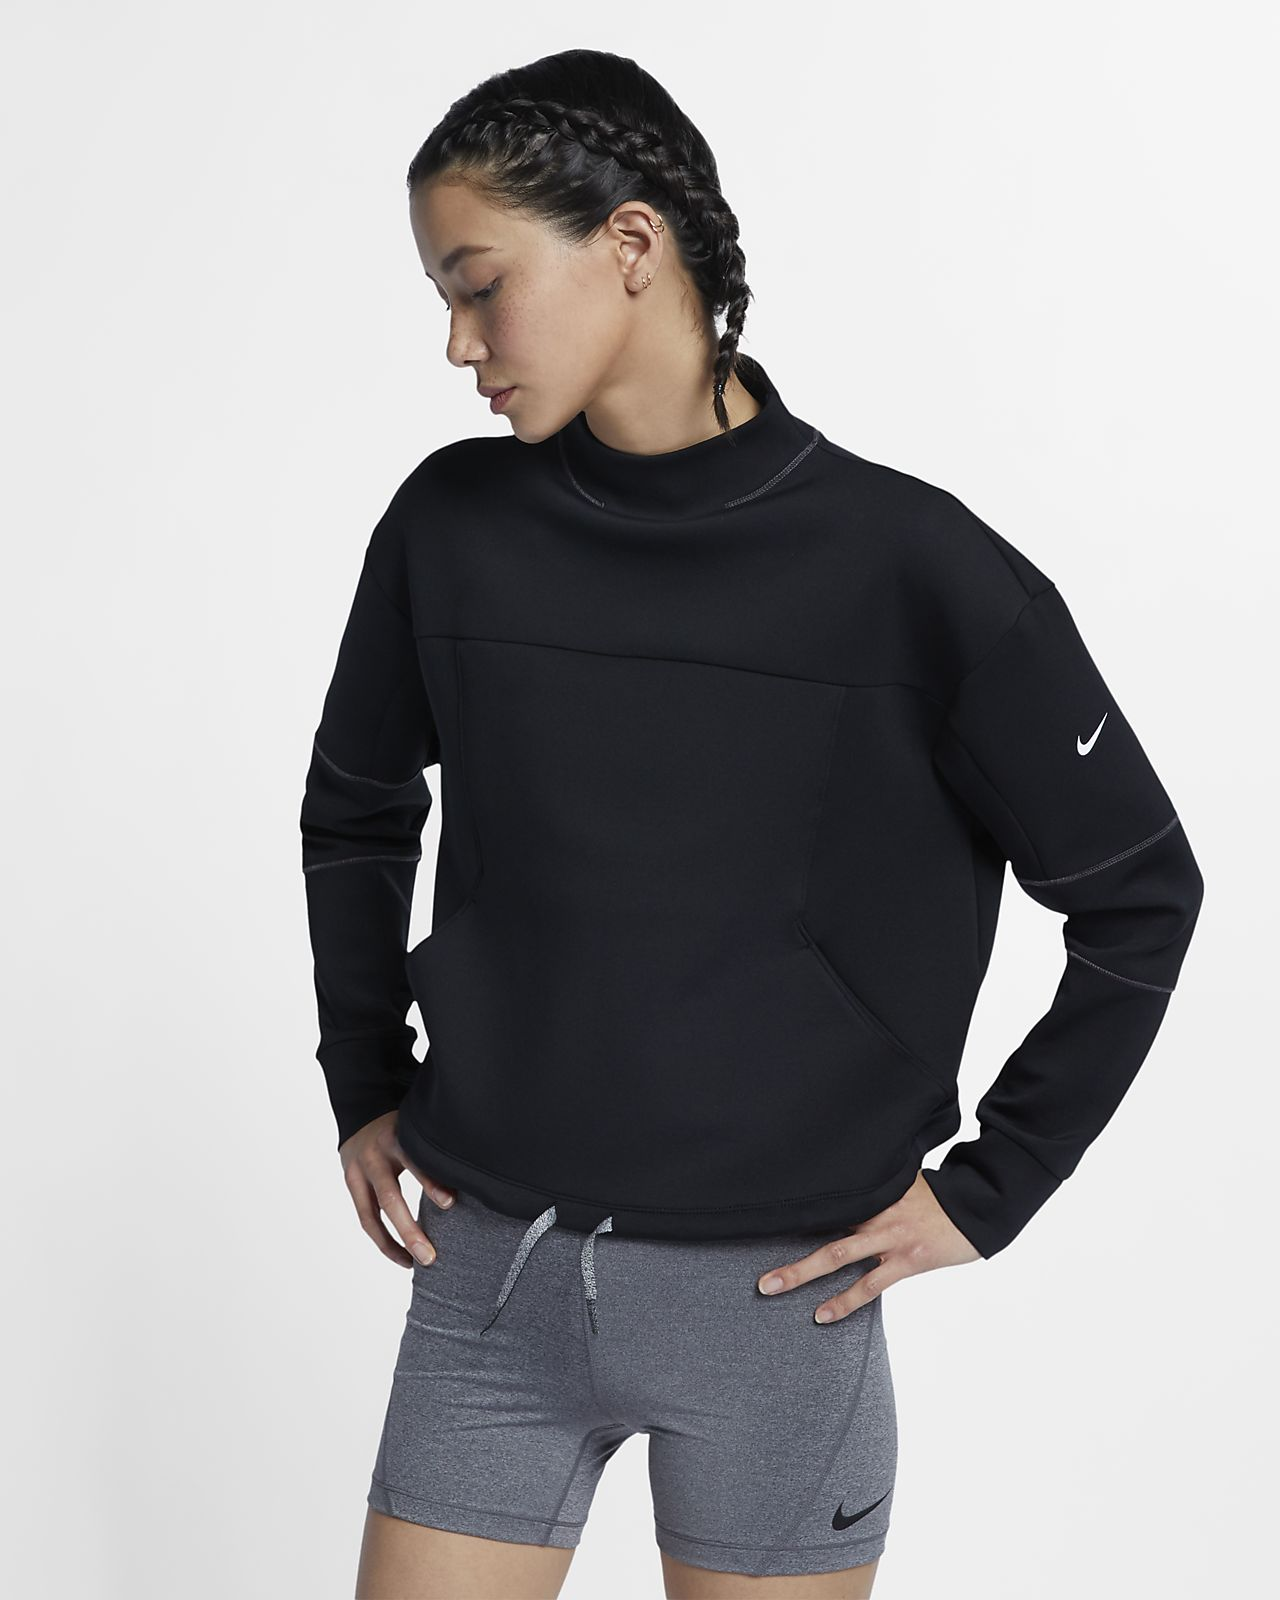 22f5fc691f0e1 Nike Dri-FIT Women s Long-Sleeve Cropped Training Top. Nike.com NO